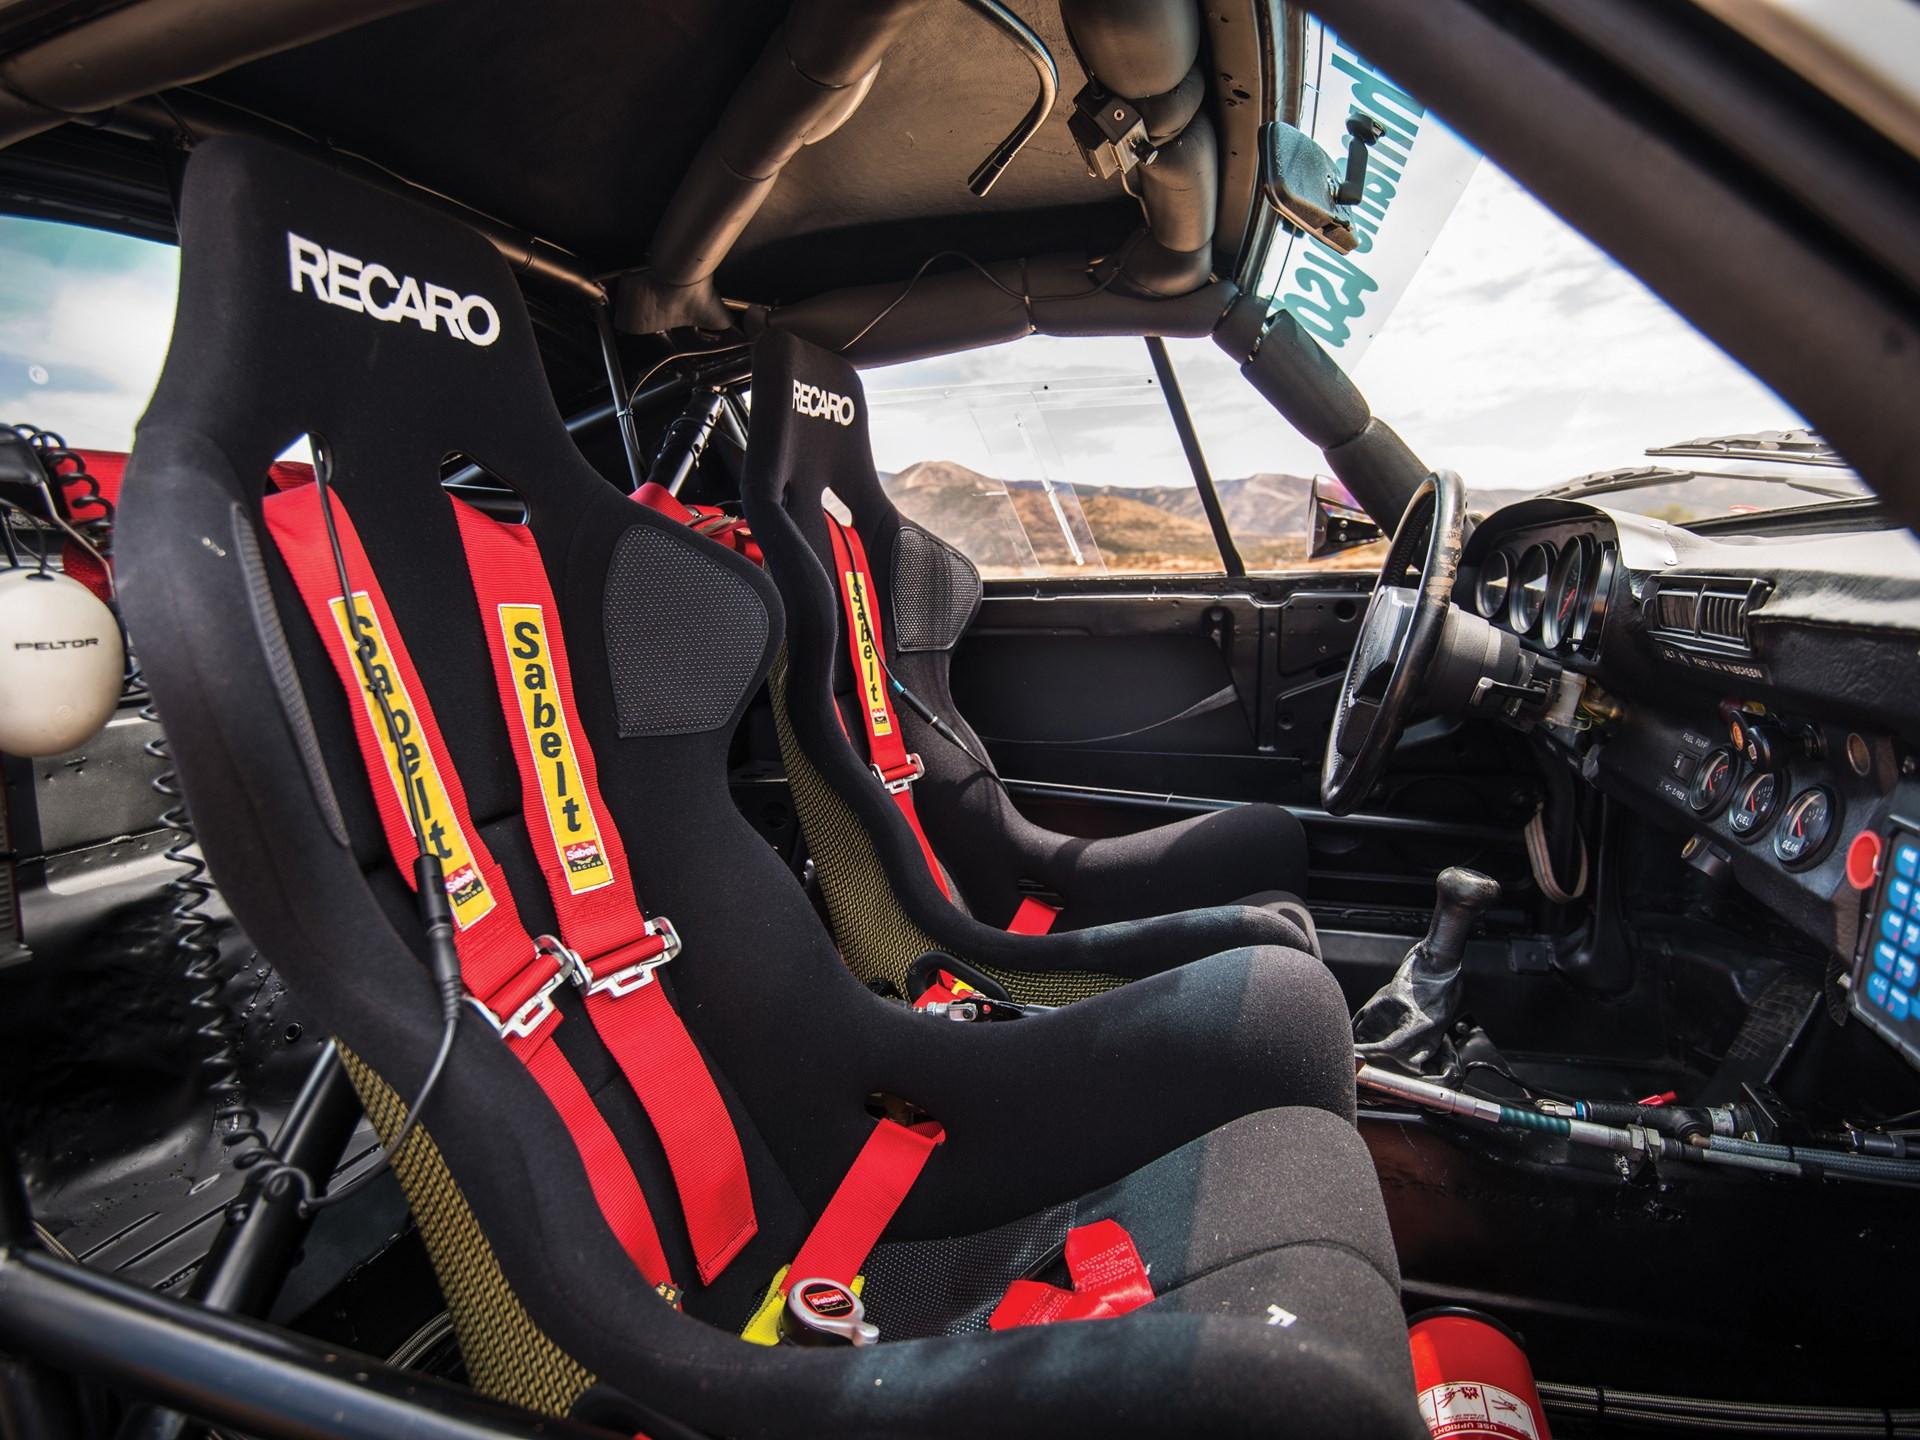 1985 Porsche 959 Paris-Dakar interior seats